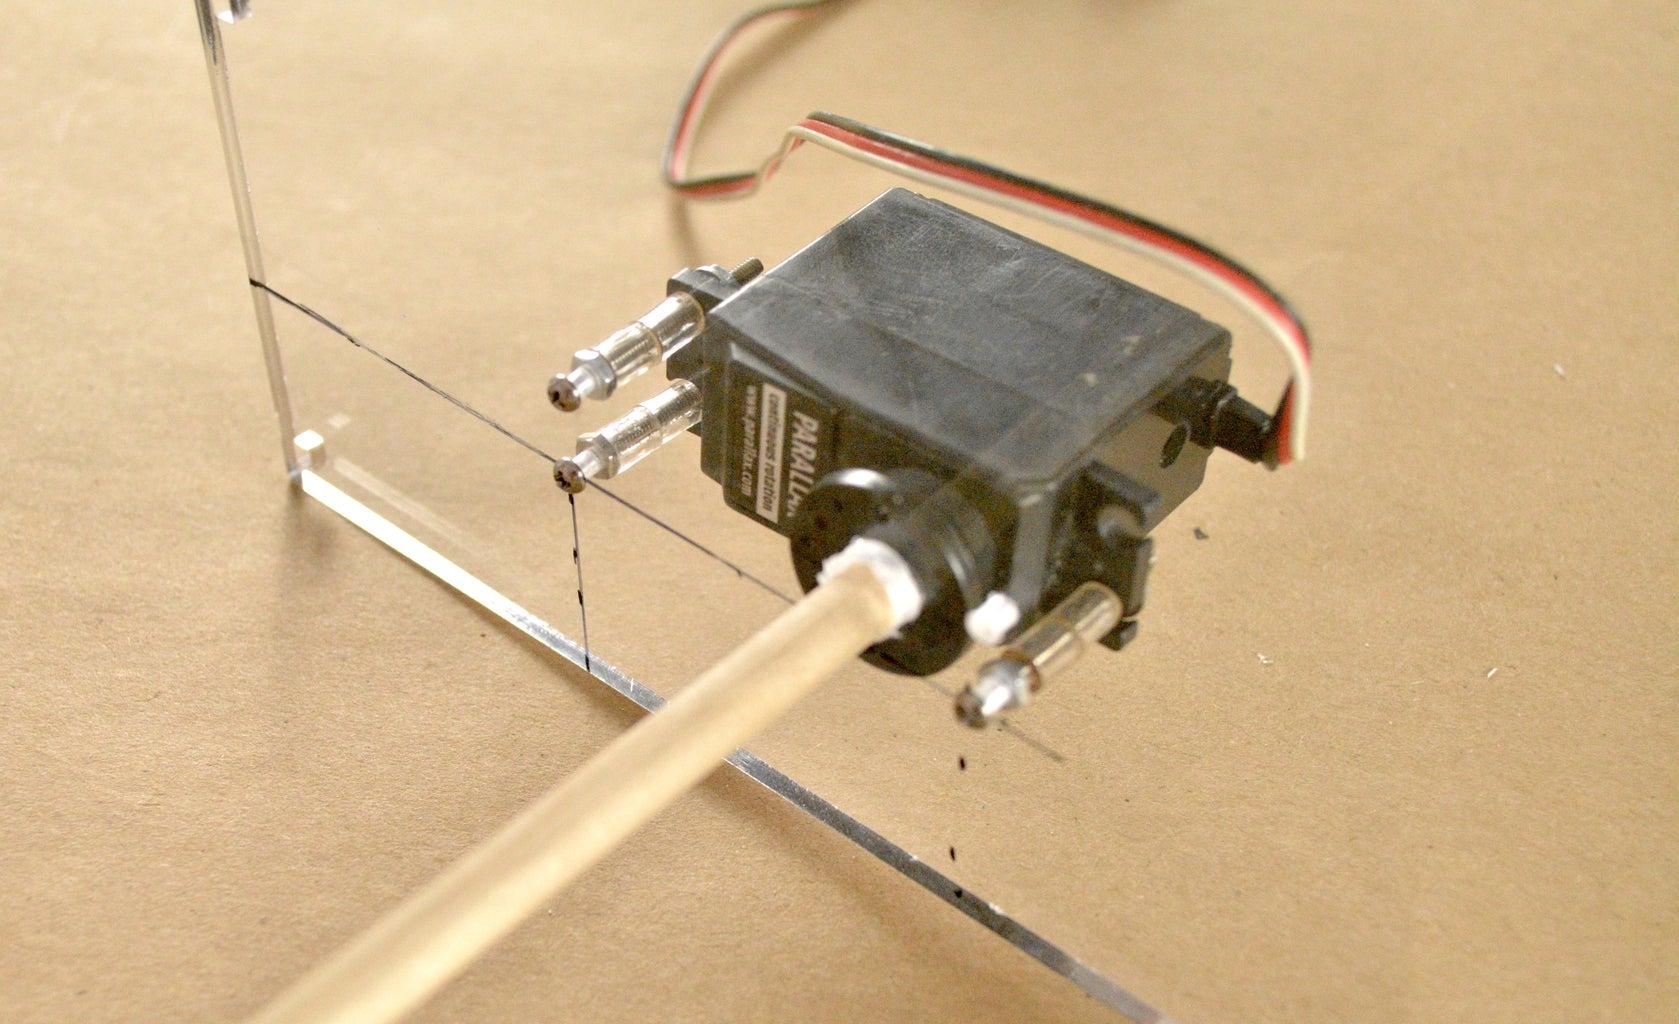 Attach Motor and Arduino